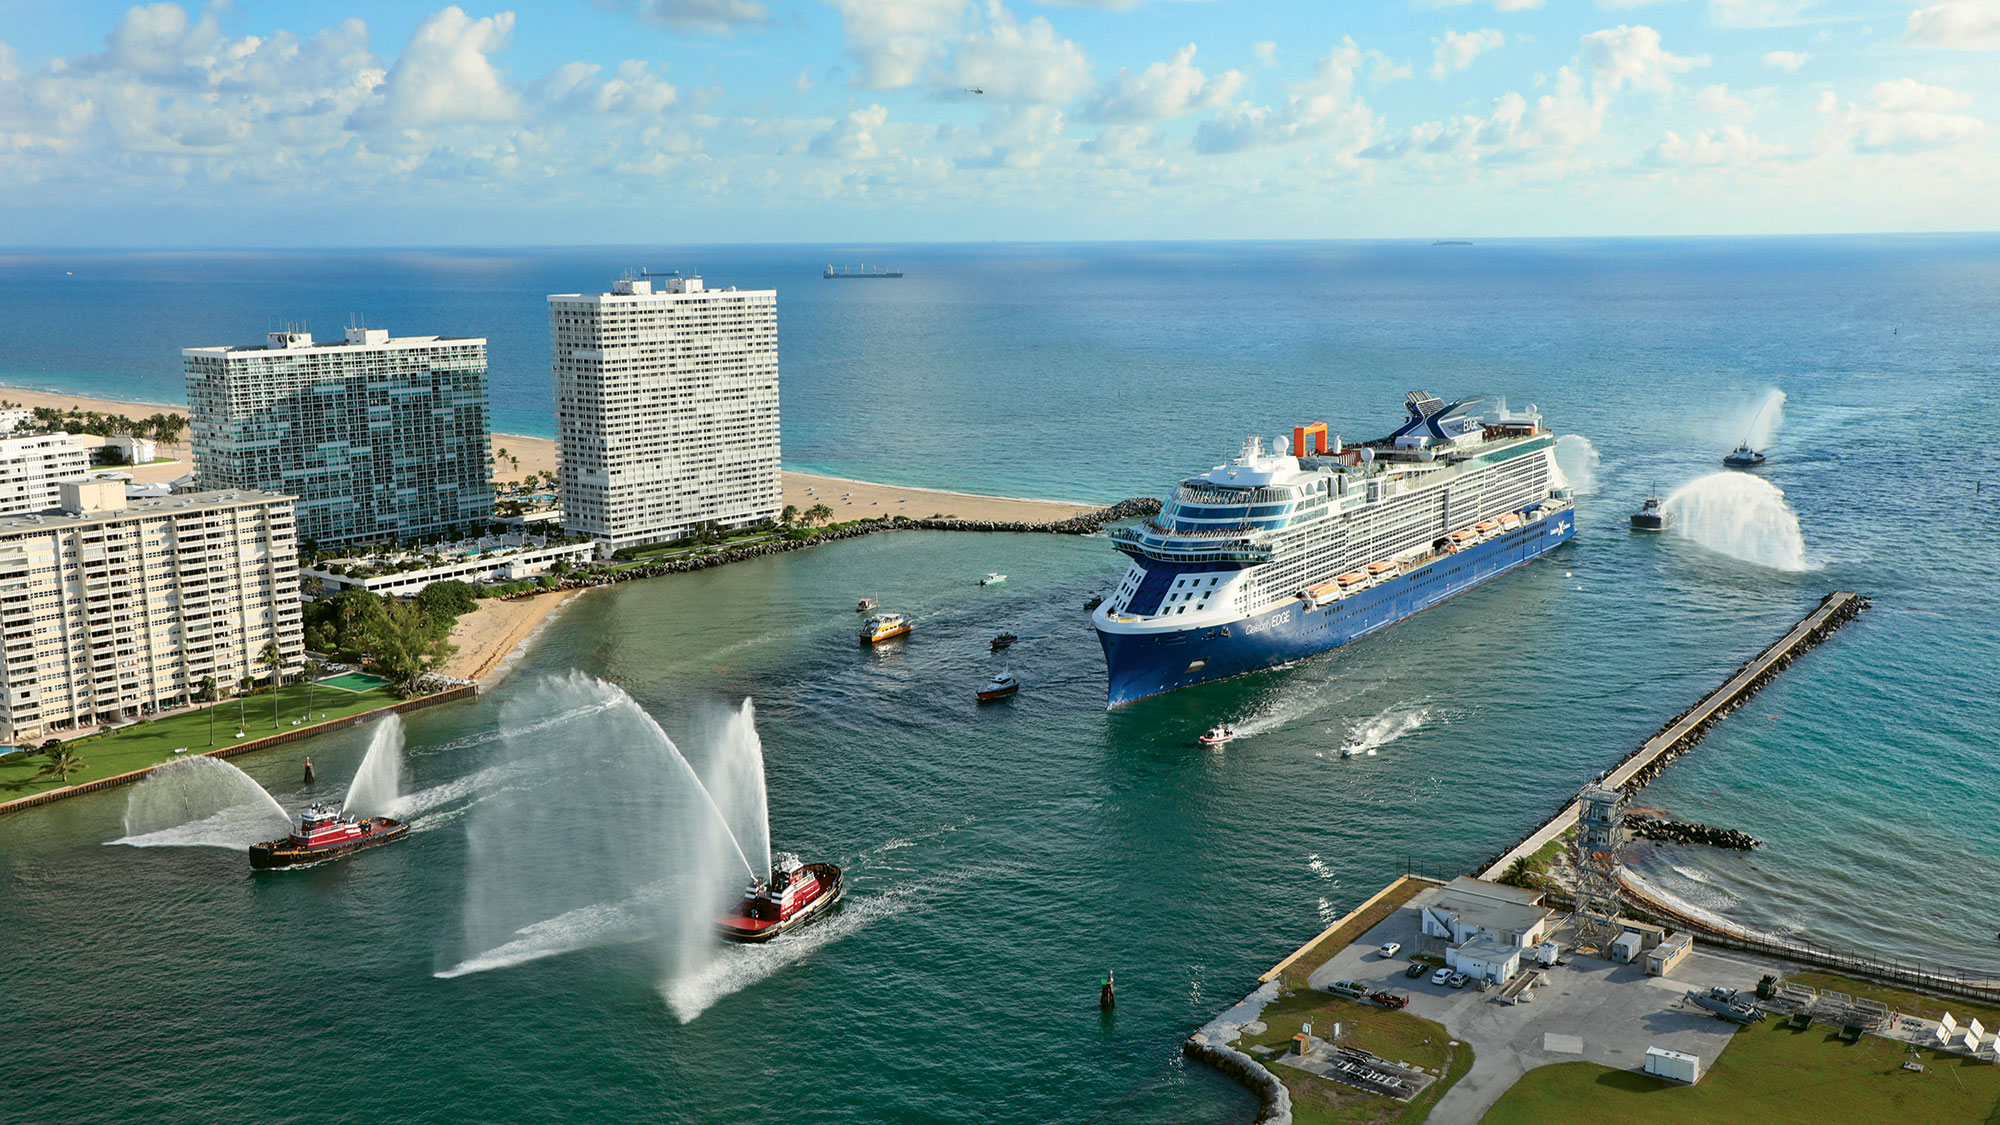 Celebrity Edge arrives in Fort Lauderdale